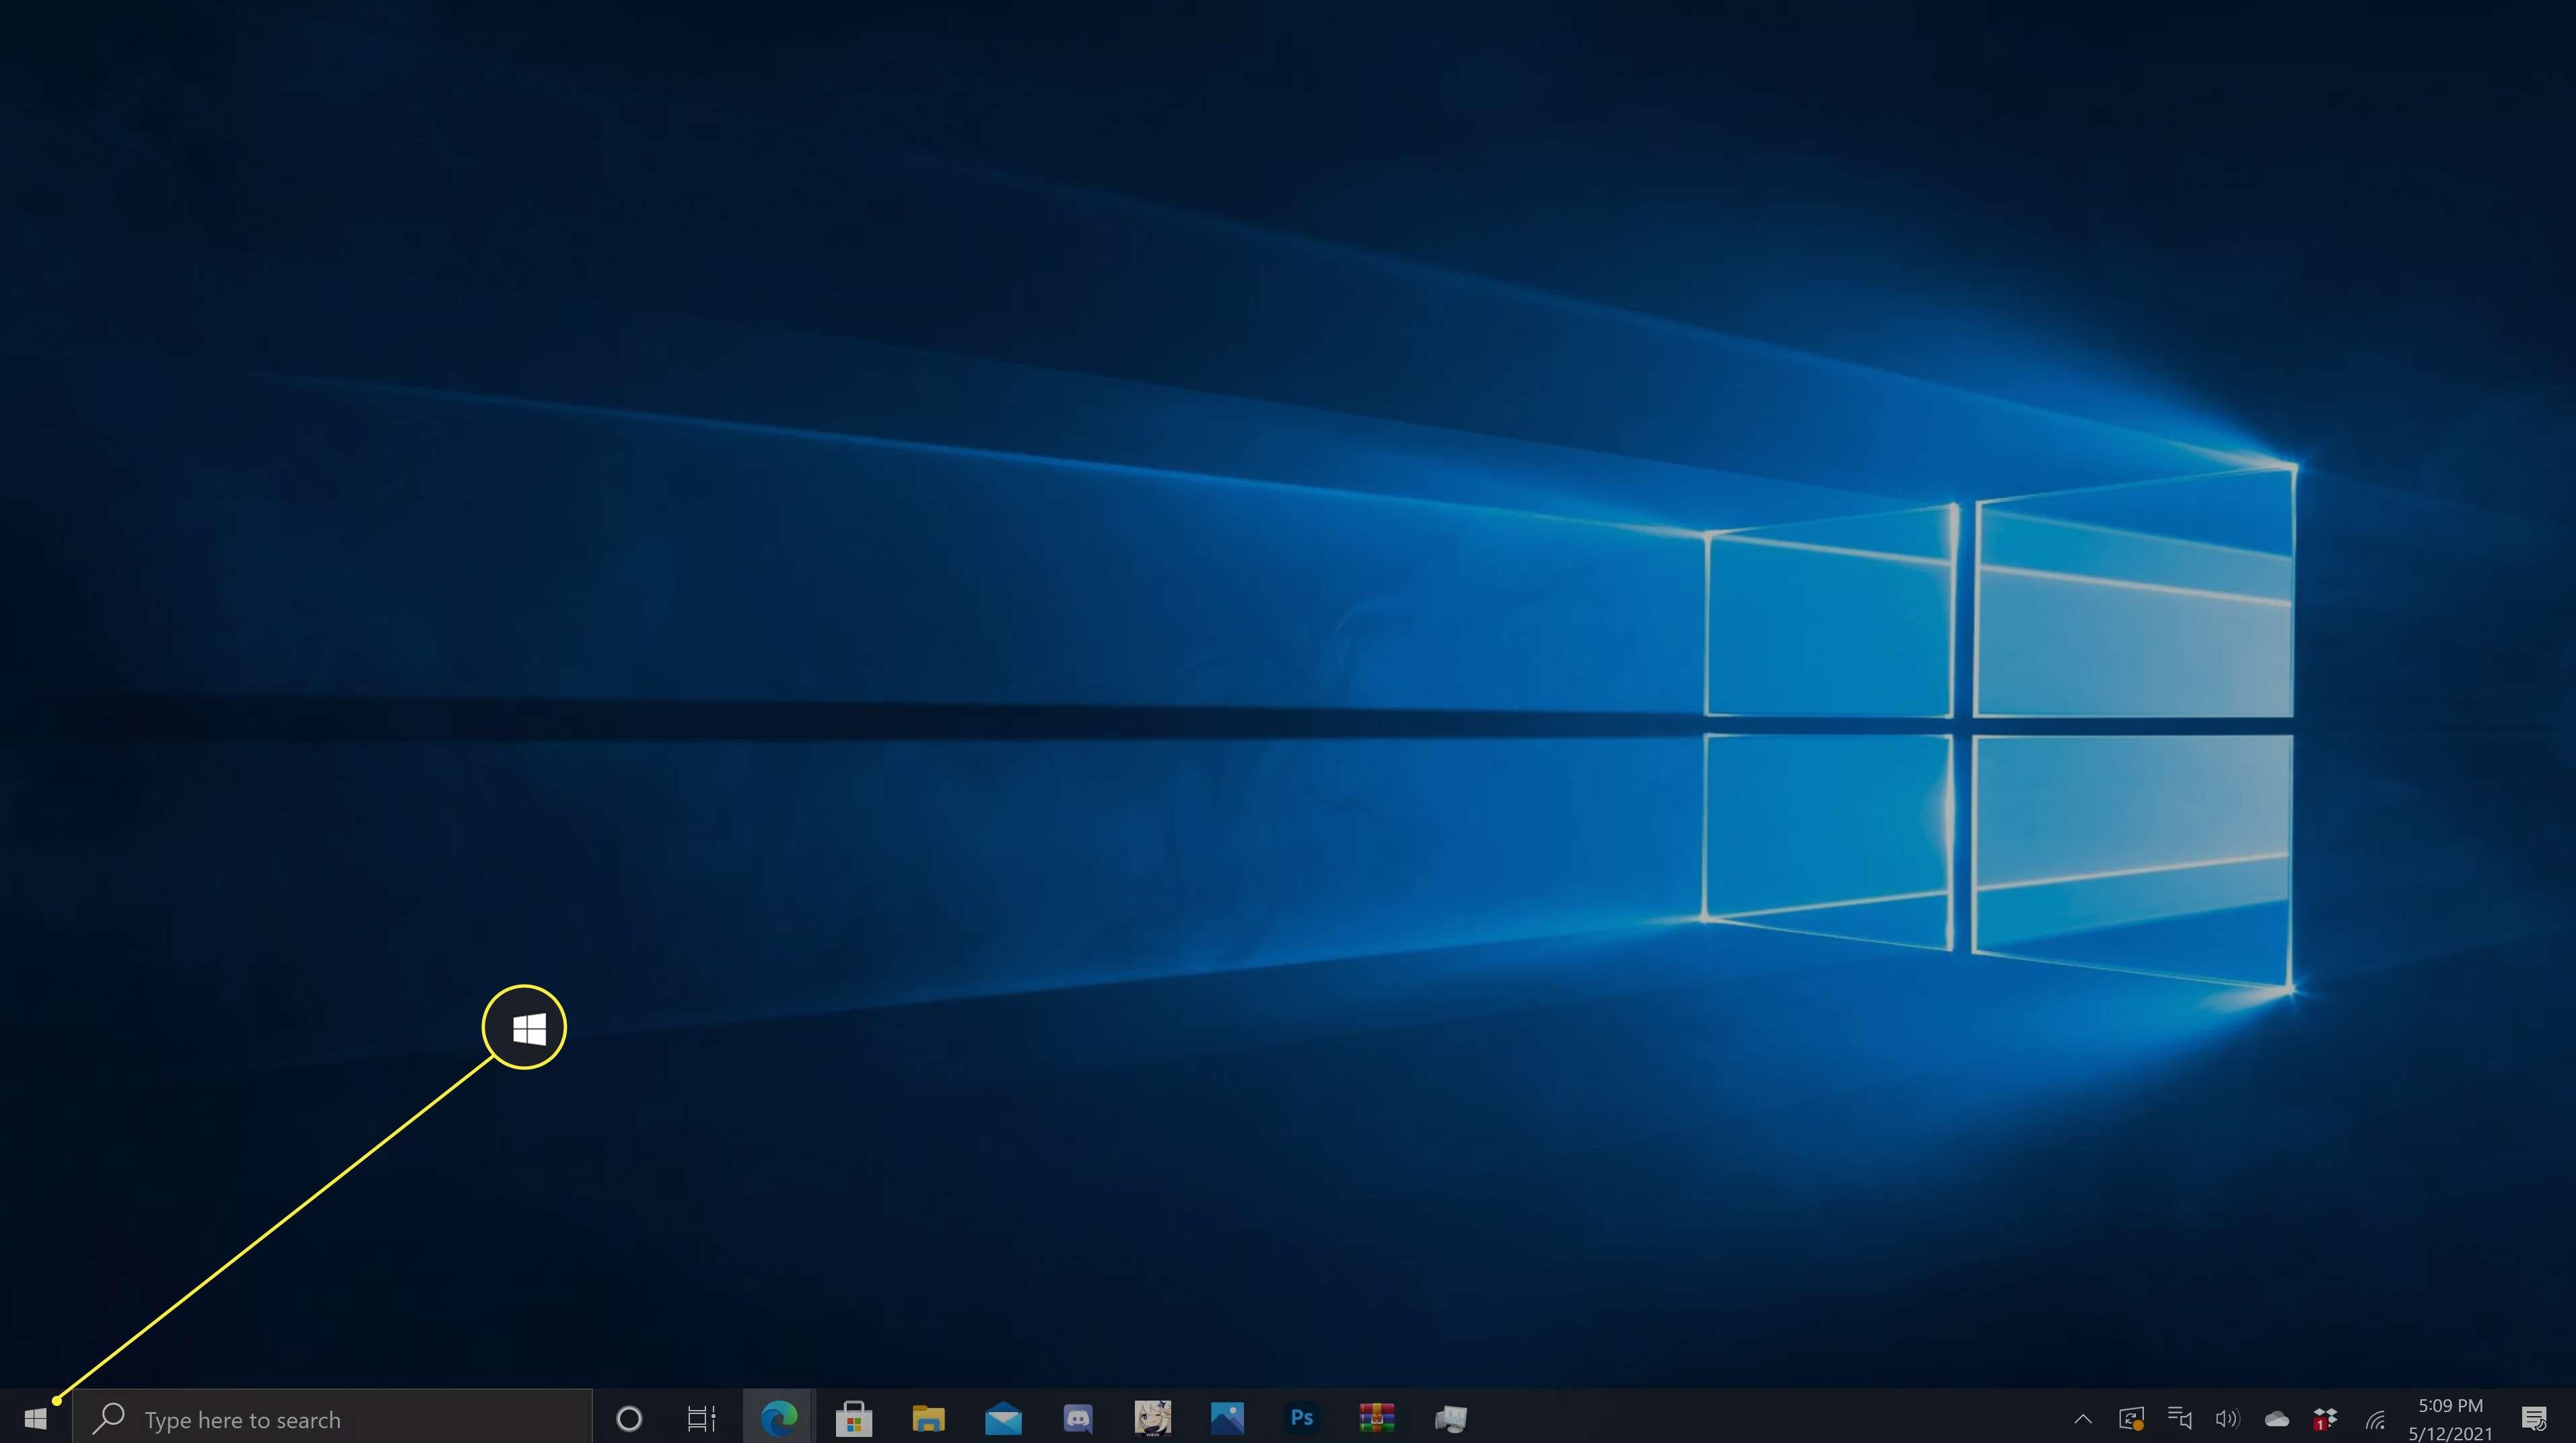 Start Menu (windows icon) highlighted on the Windows 10 taskbar.